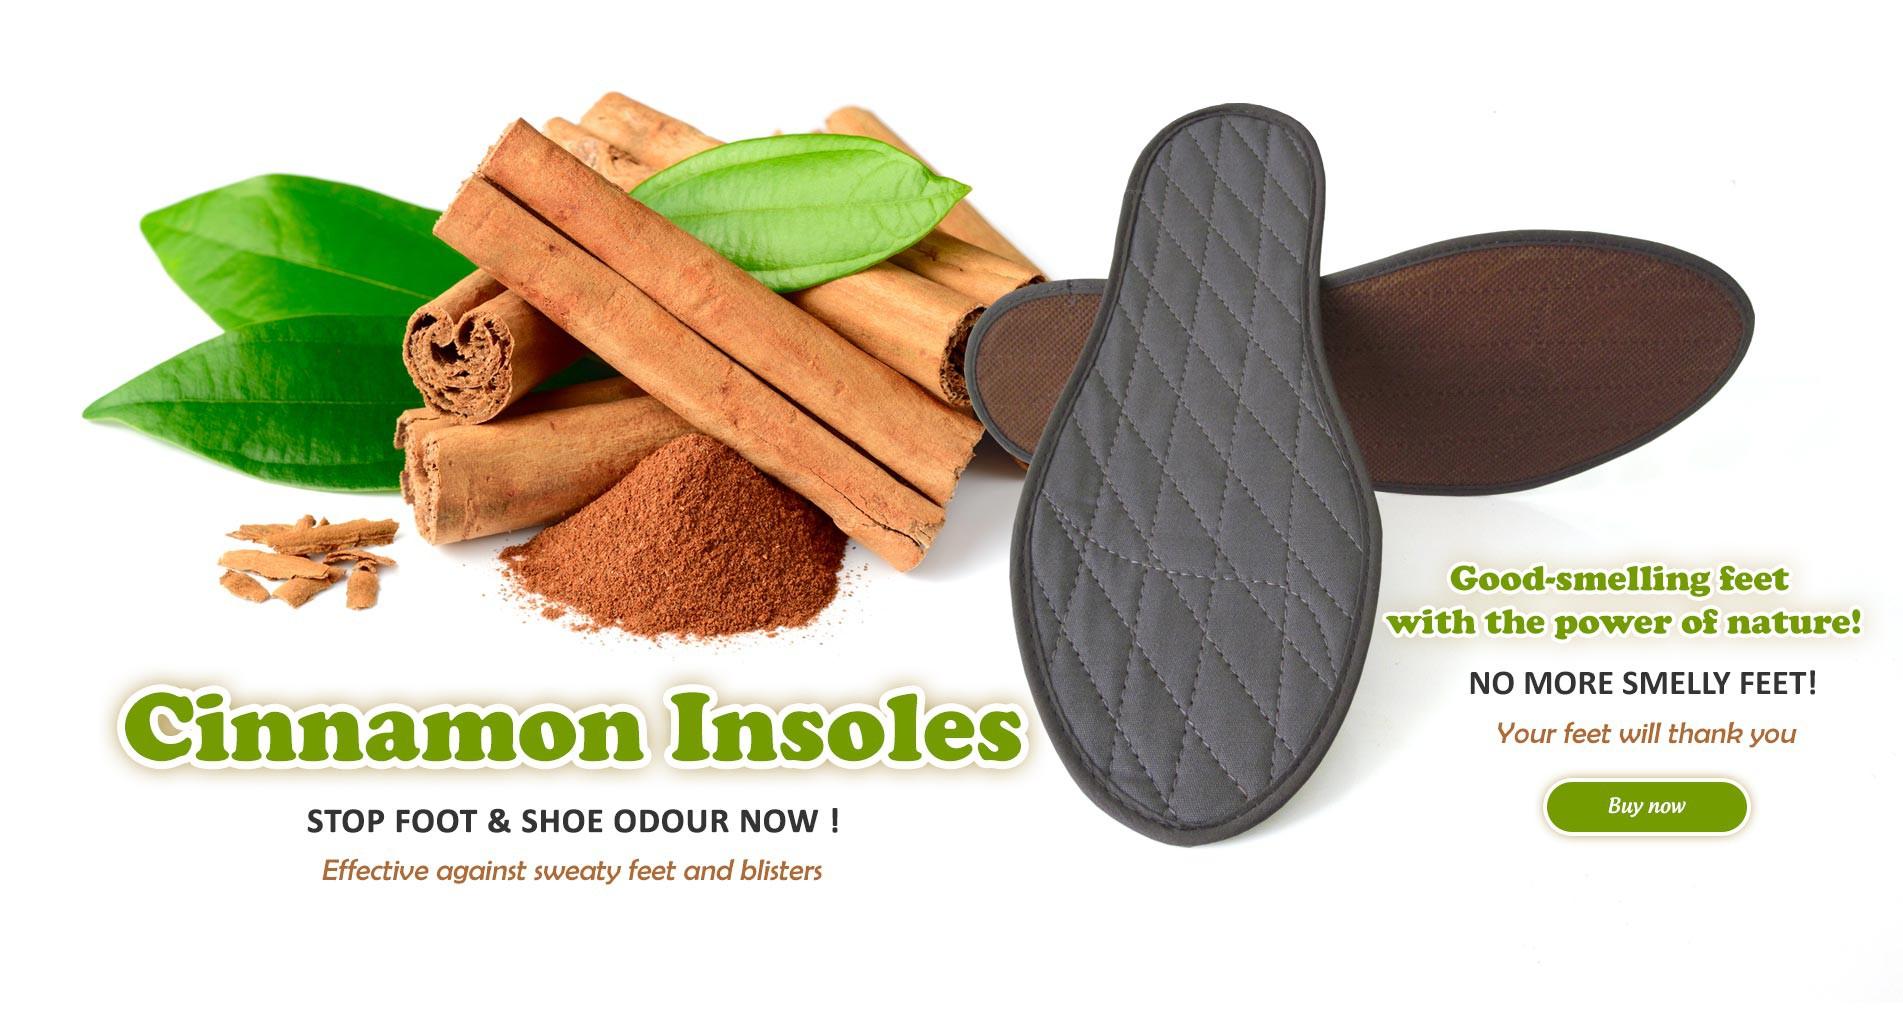 Cinnamon Insoles